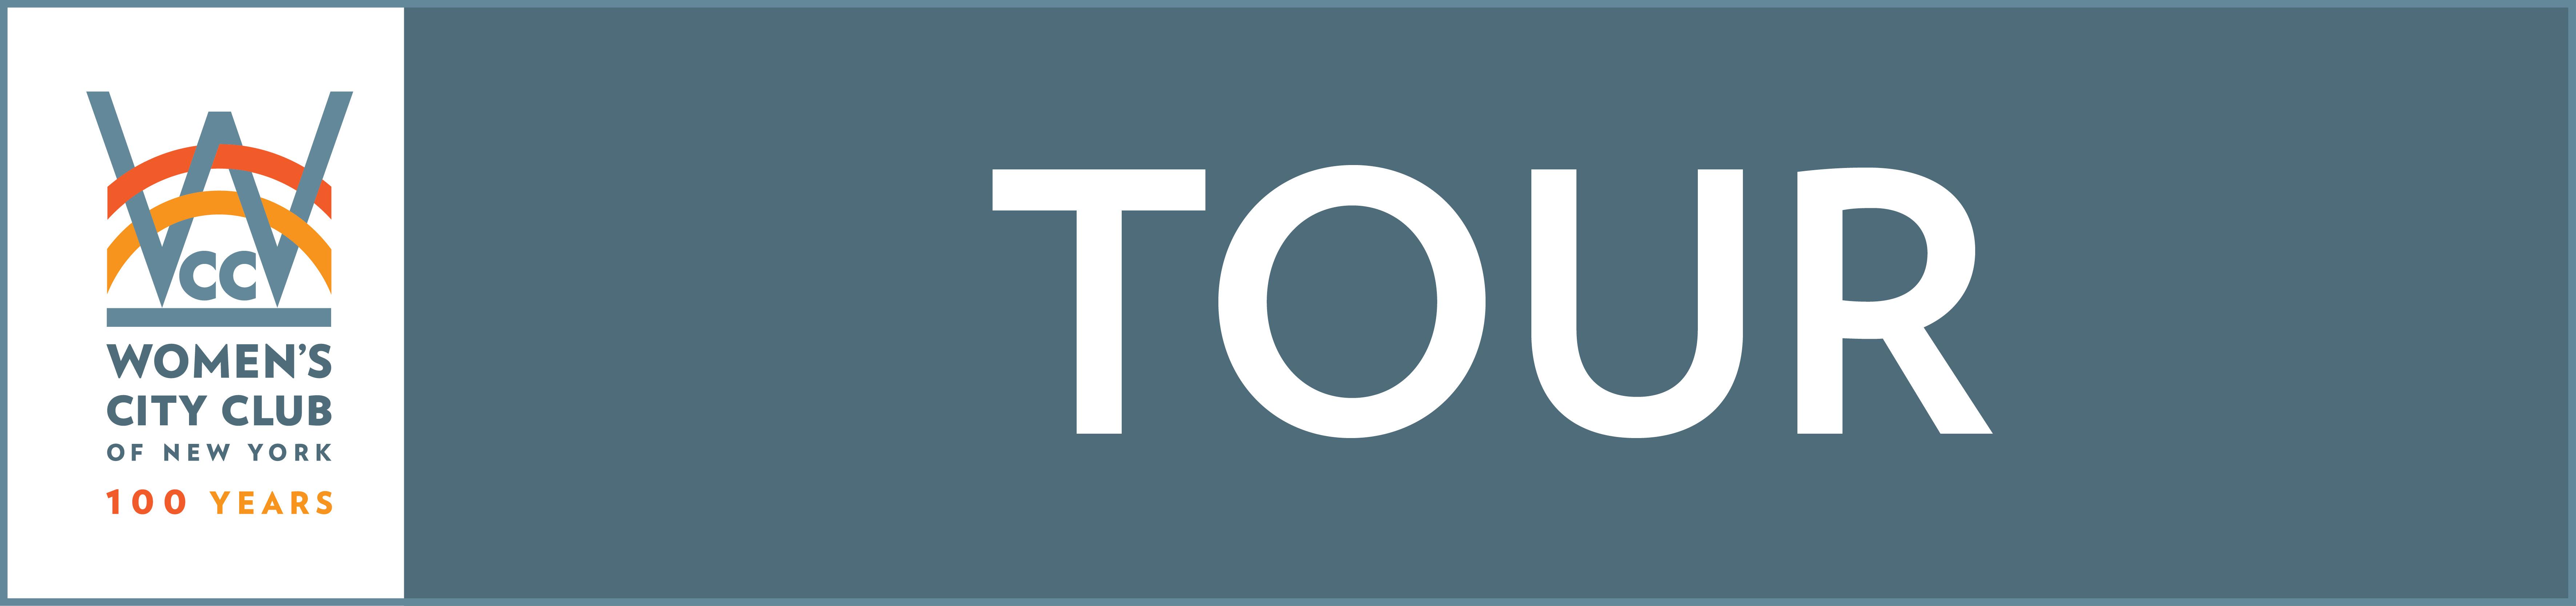 9_20_banners_tour.jpg